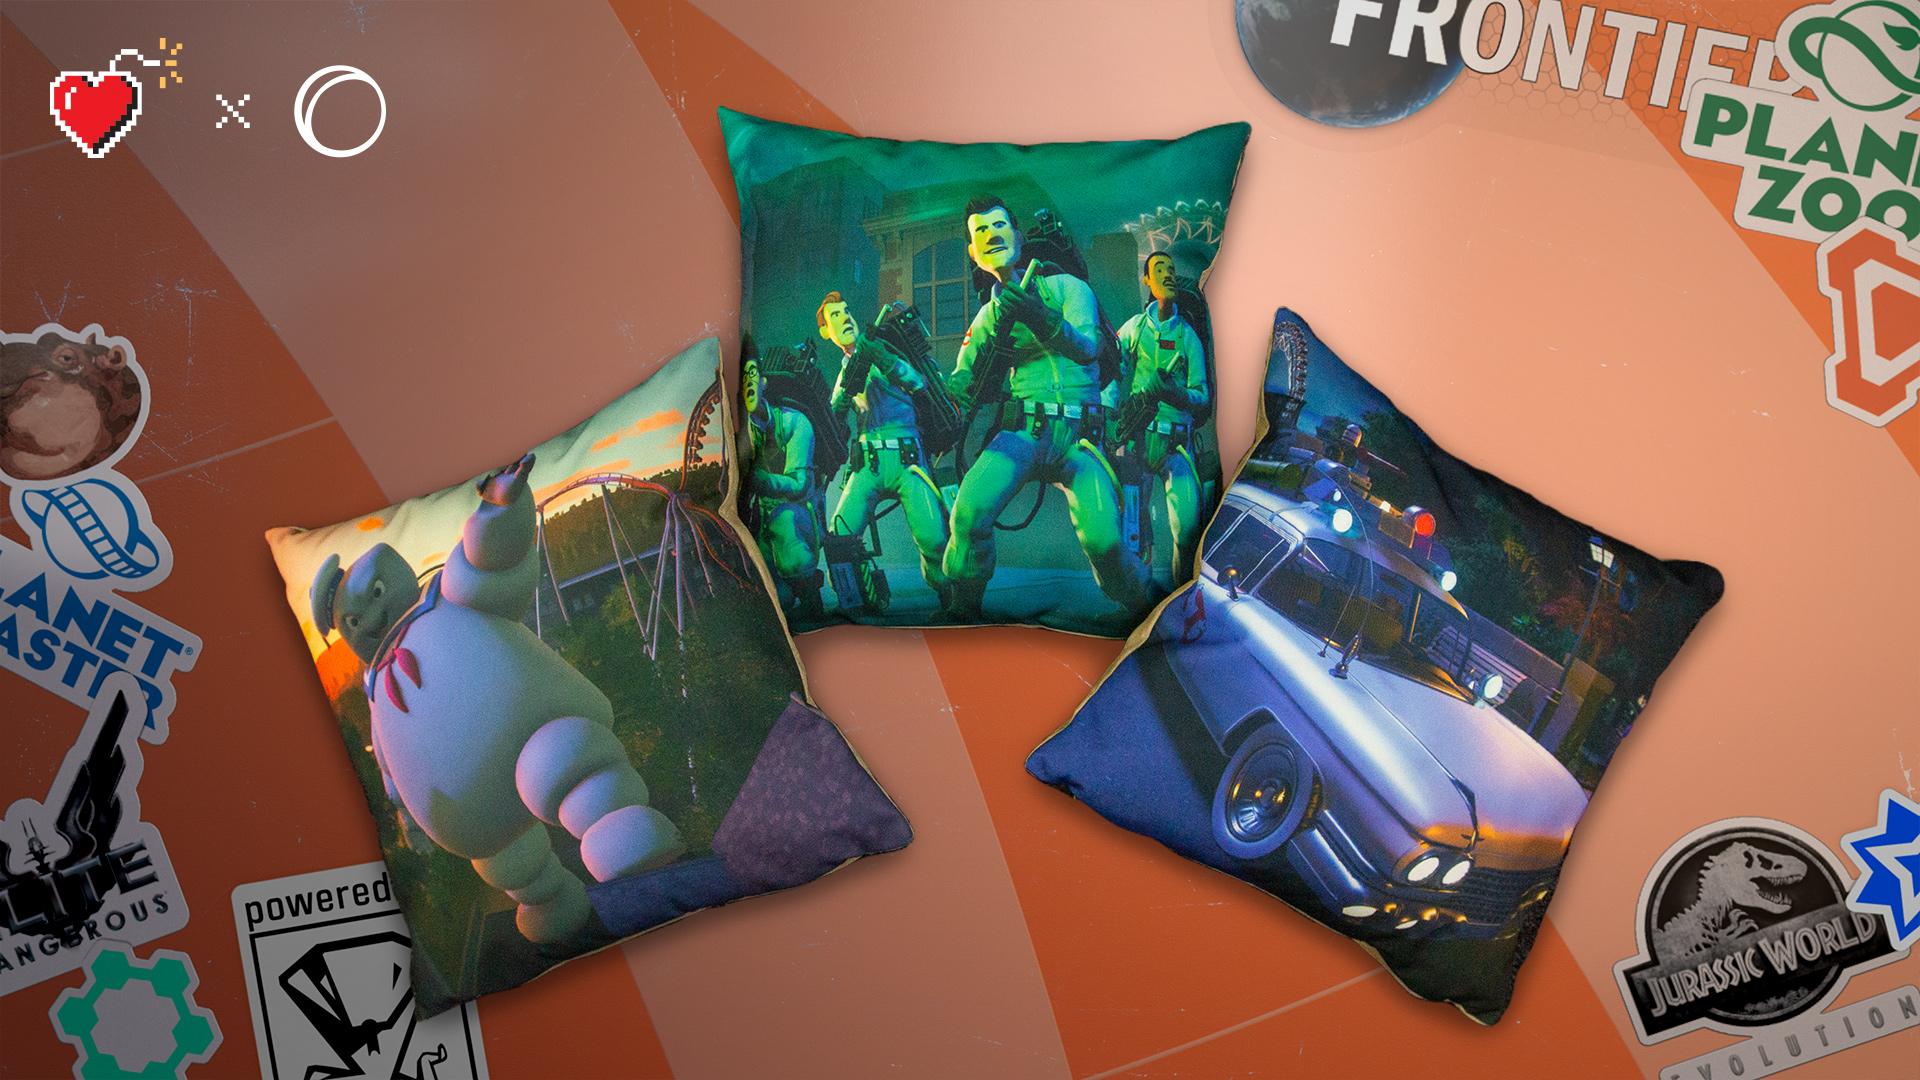 FR_charity_auction_PC_pillows.jpg